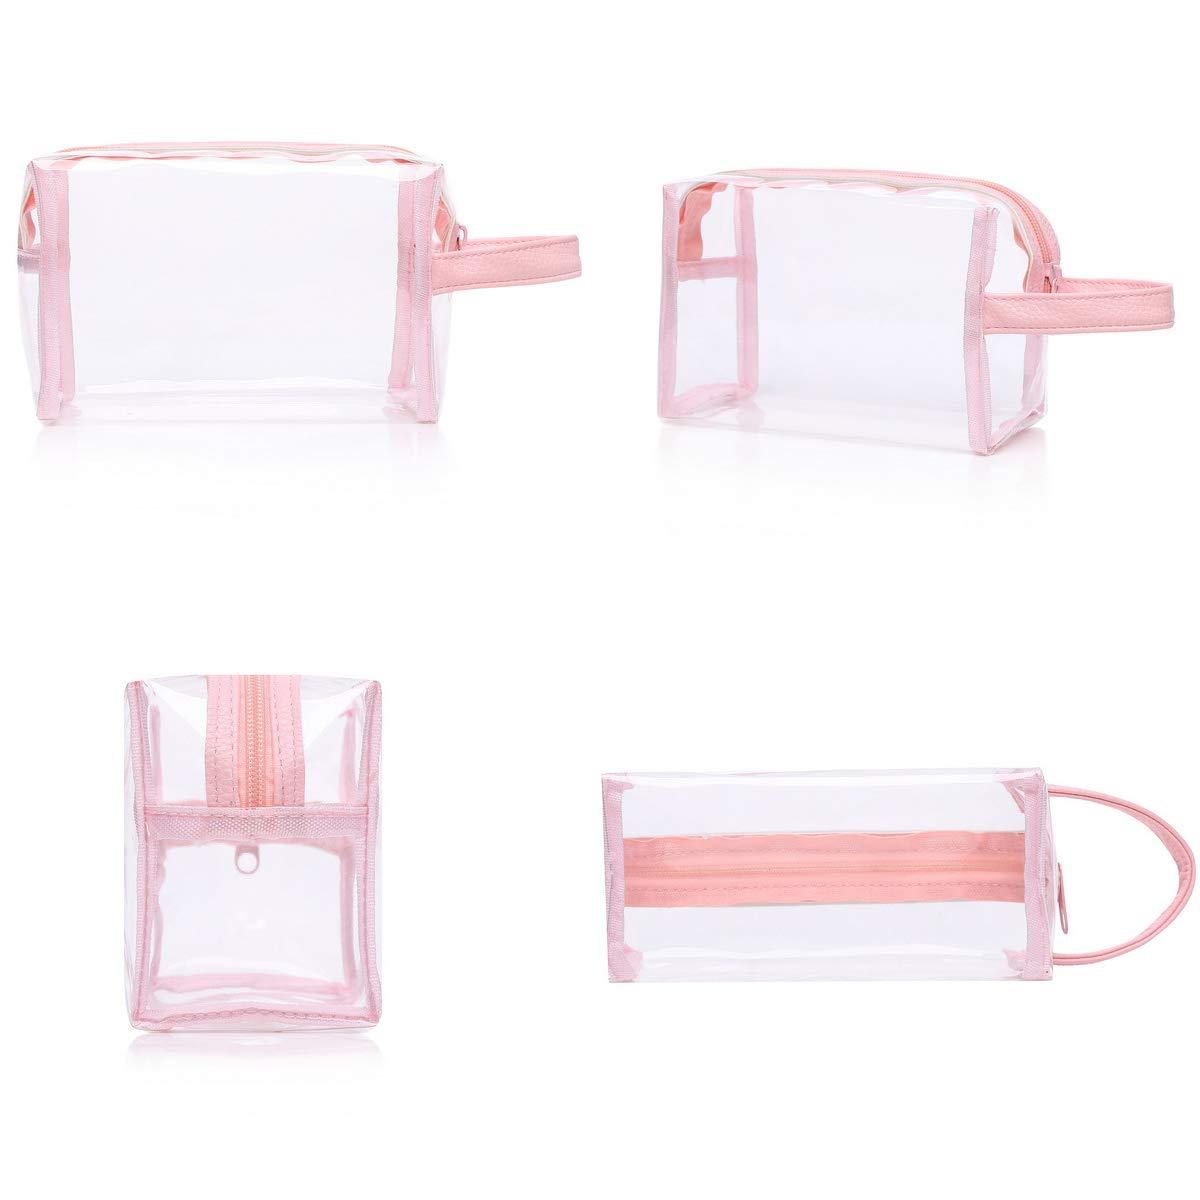 Amazon.com: Bolsa organizadora de maquillaje con diseño de ...